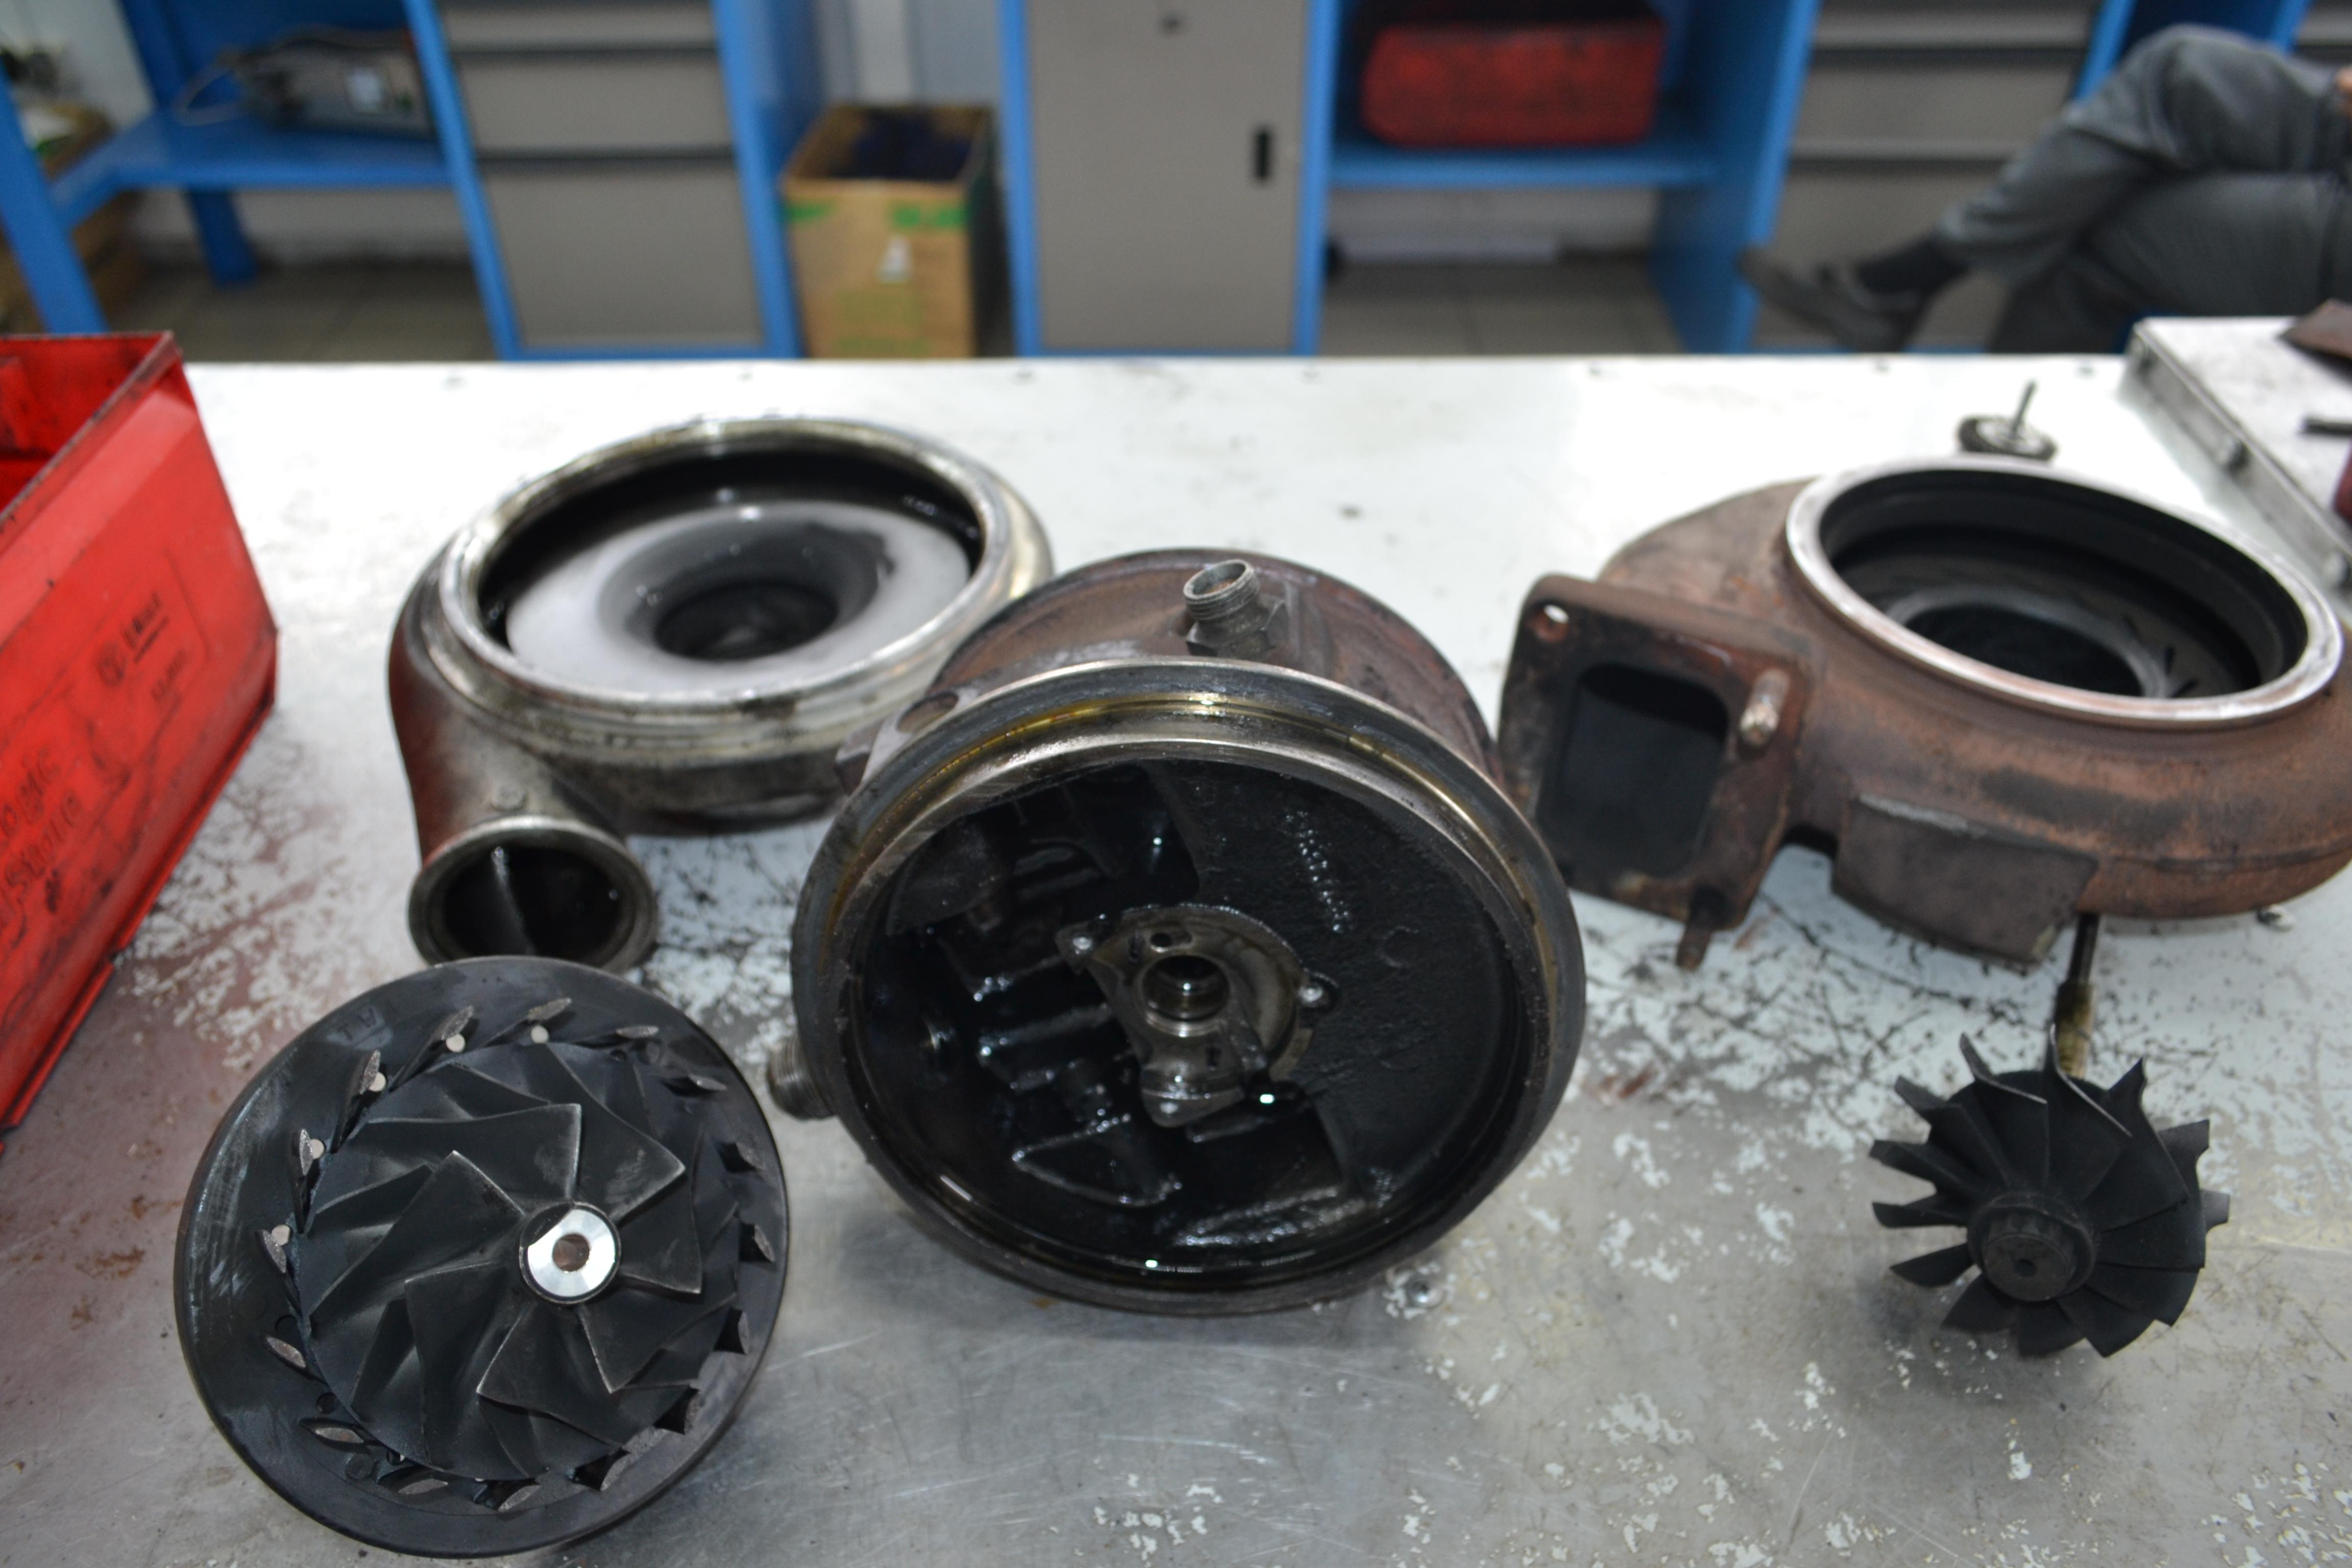 Iveco Cursor, ивеко курсор, ремонт турбины, 4046943